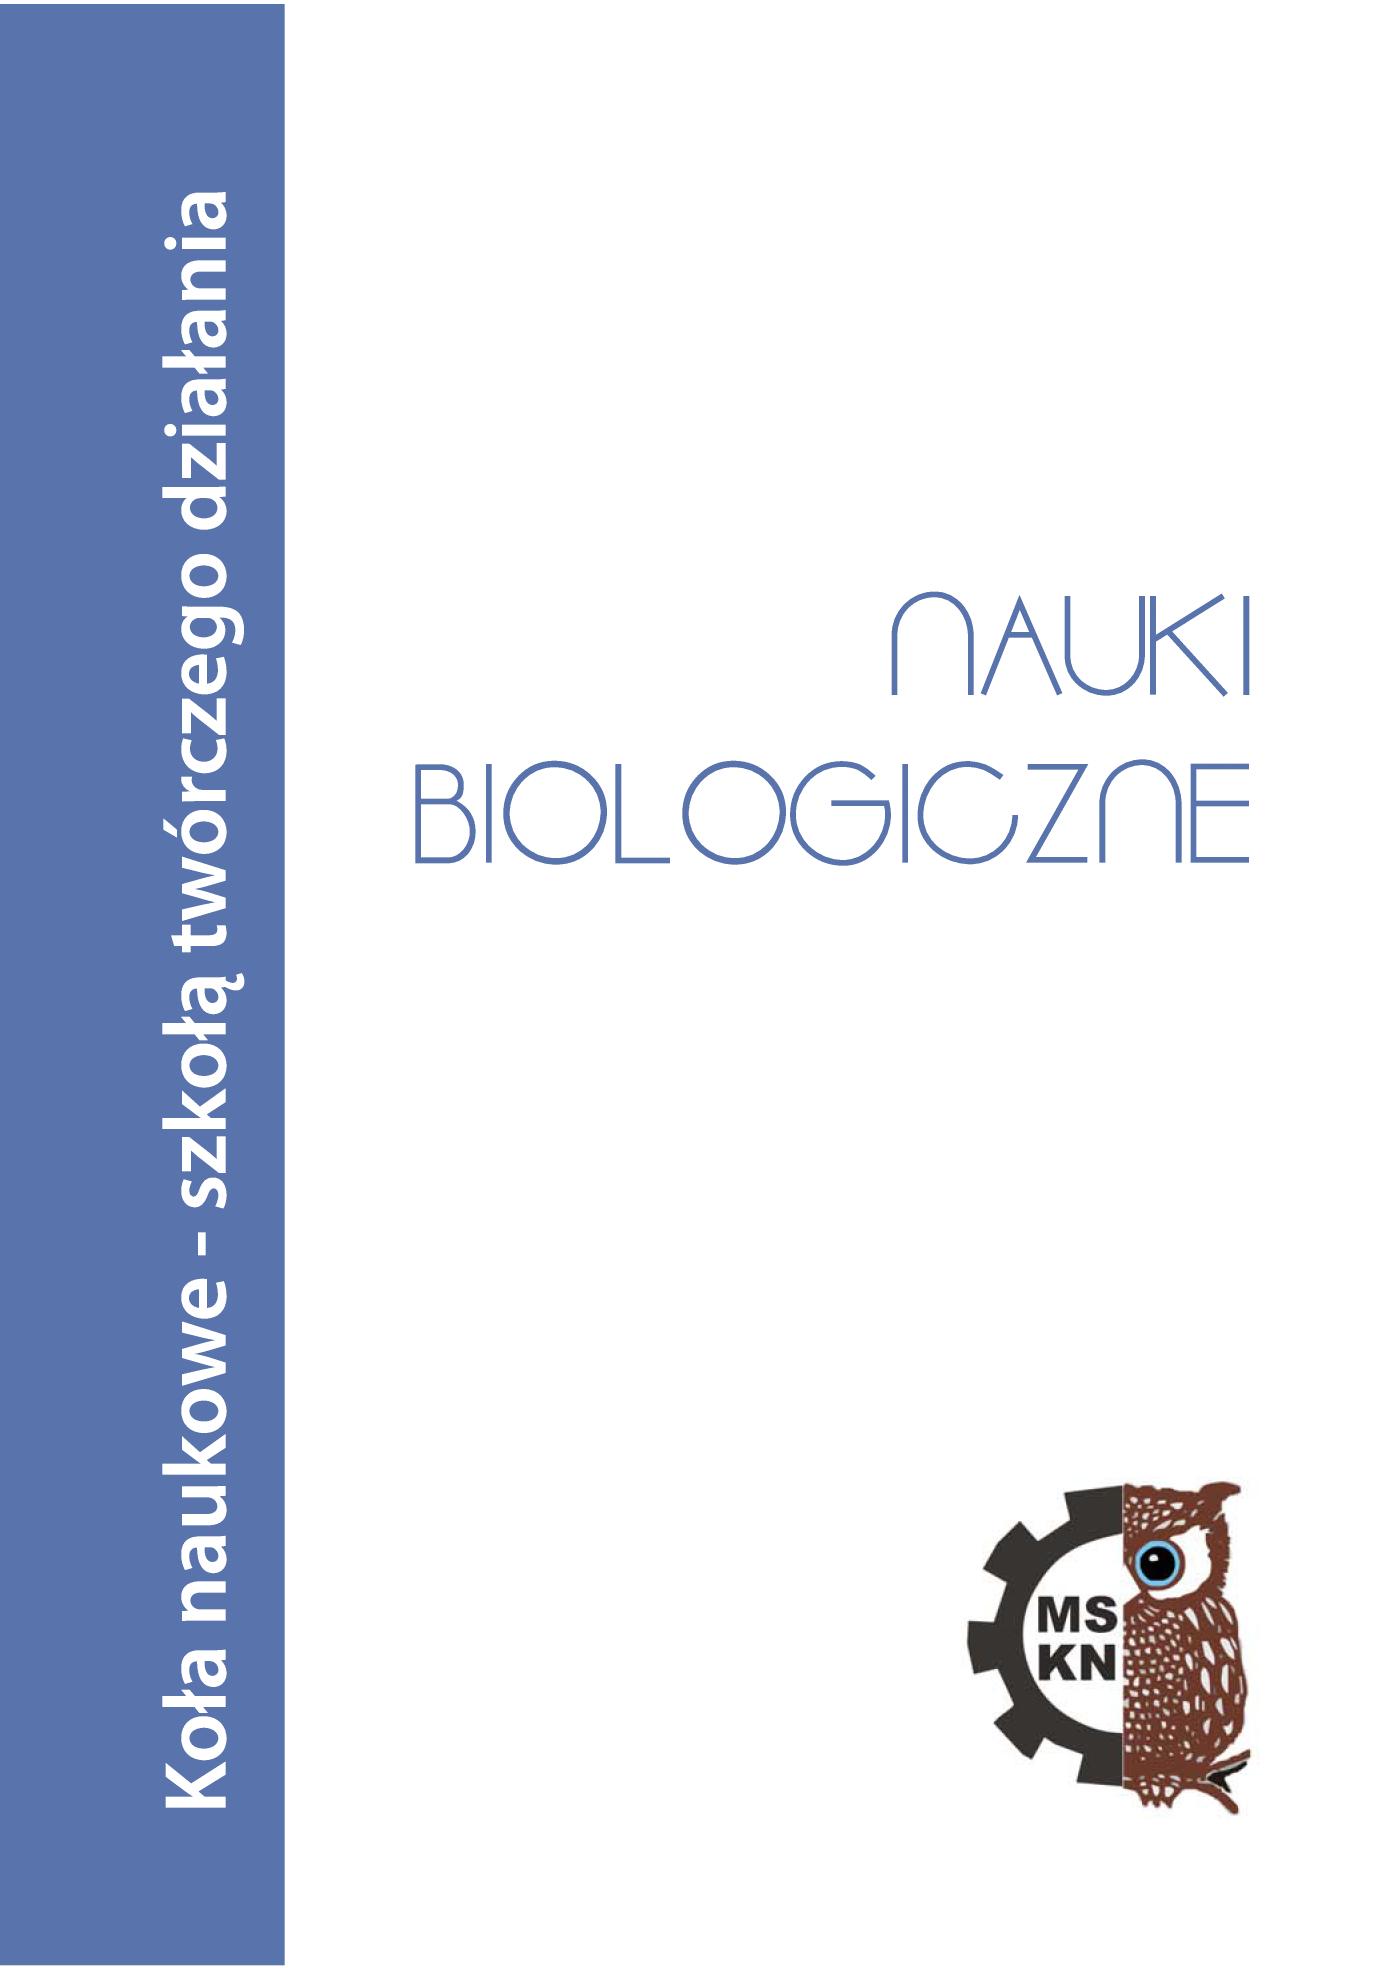 okadka_nauki_biologiczne-1_1jpg